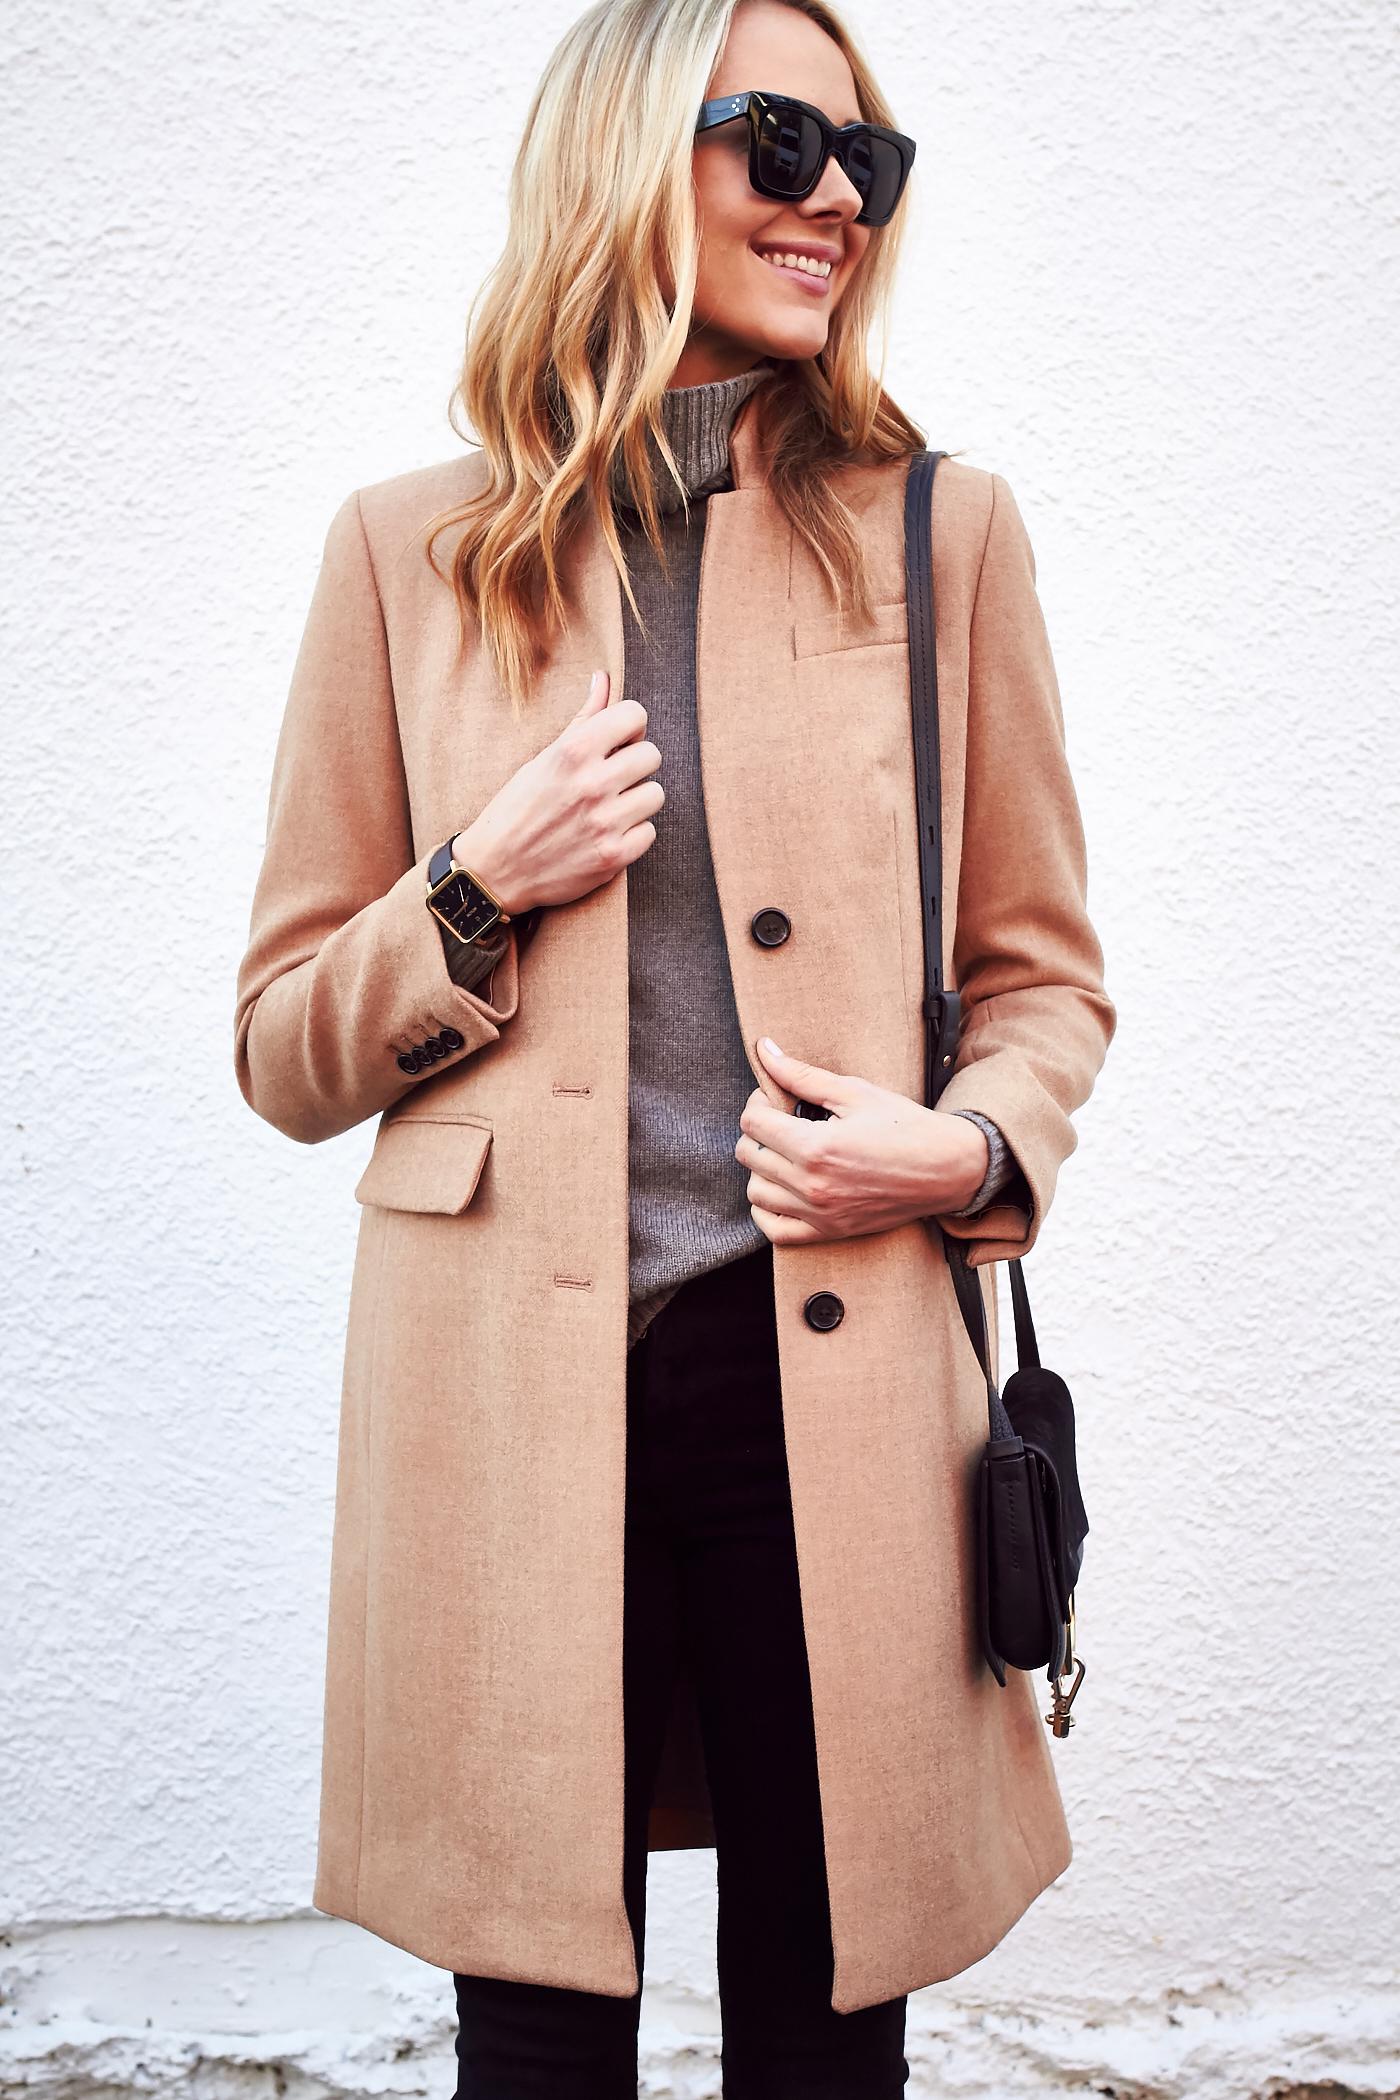 Fall Outfit, J.Crew Regent Topcoat Camel, Grey Turtleneck Sweater, Black Skinny Jeans, Chloe Faye Handbag